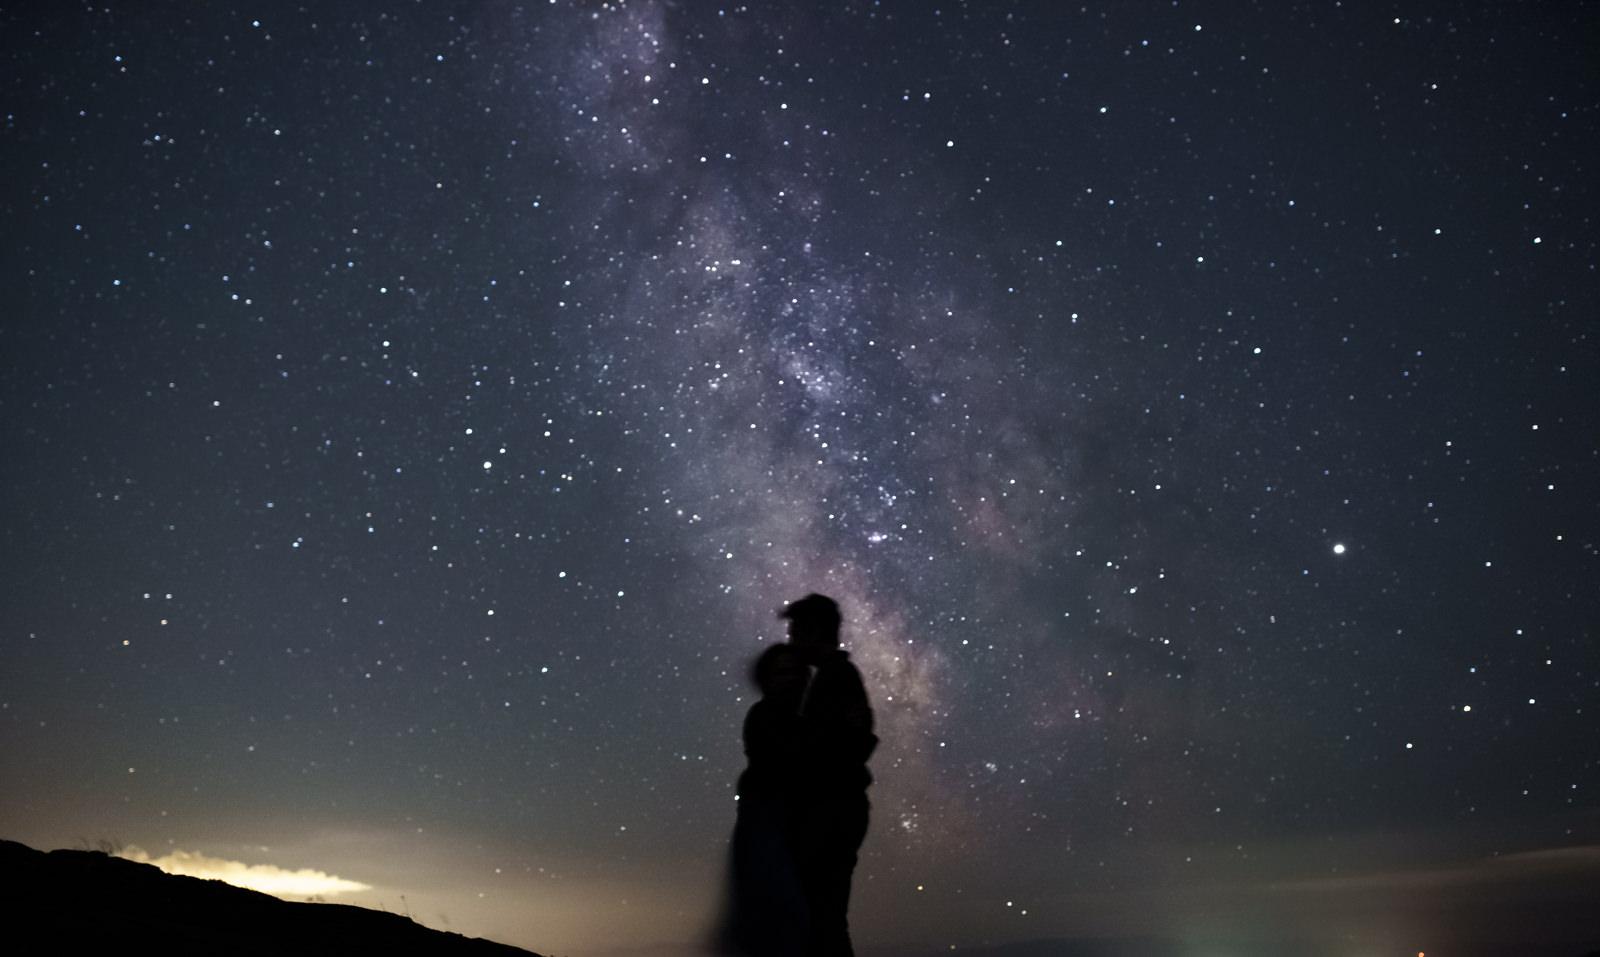 couple in milky way astrophotography-1.jpg